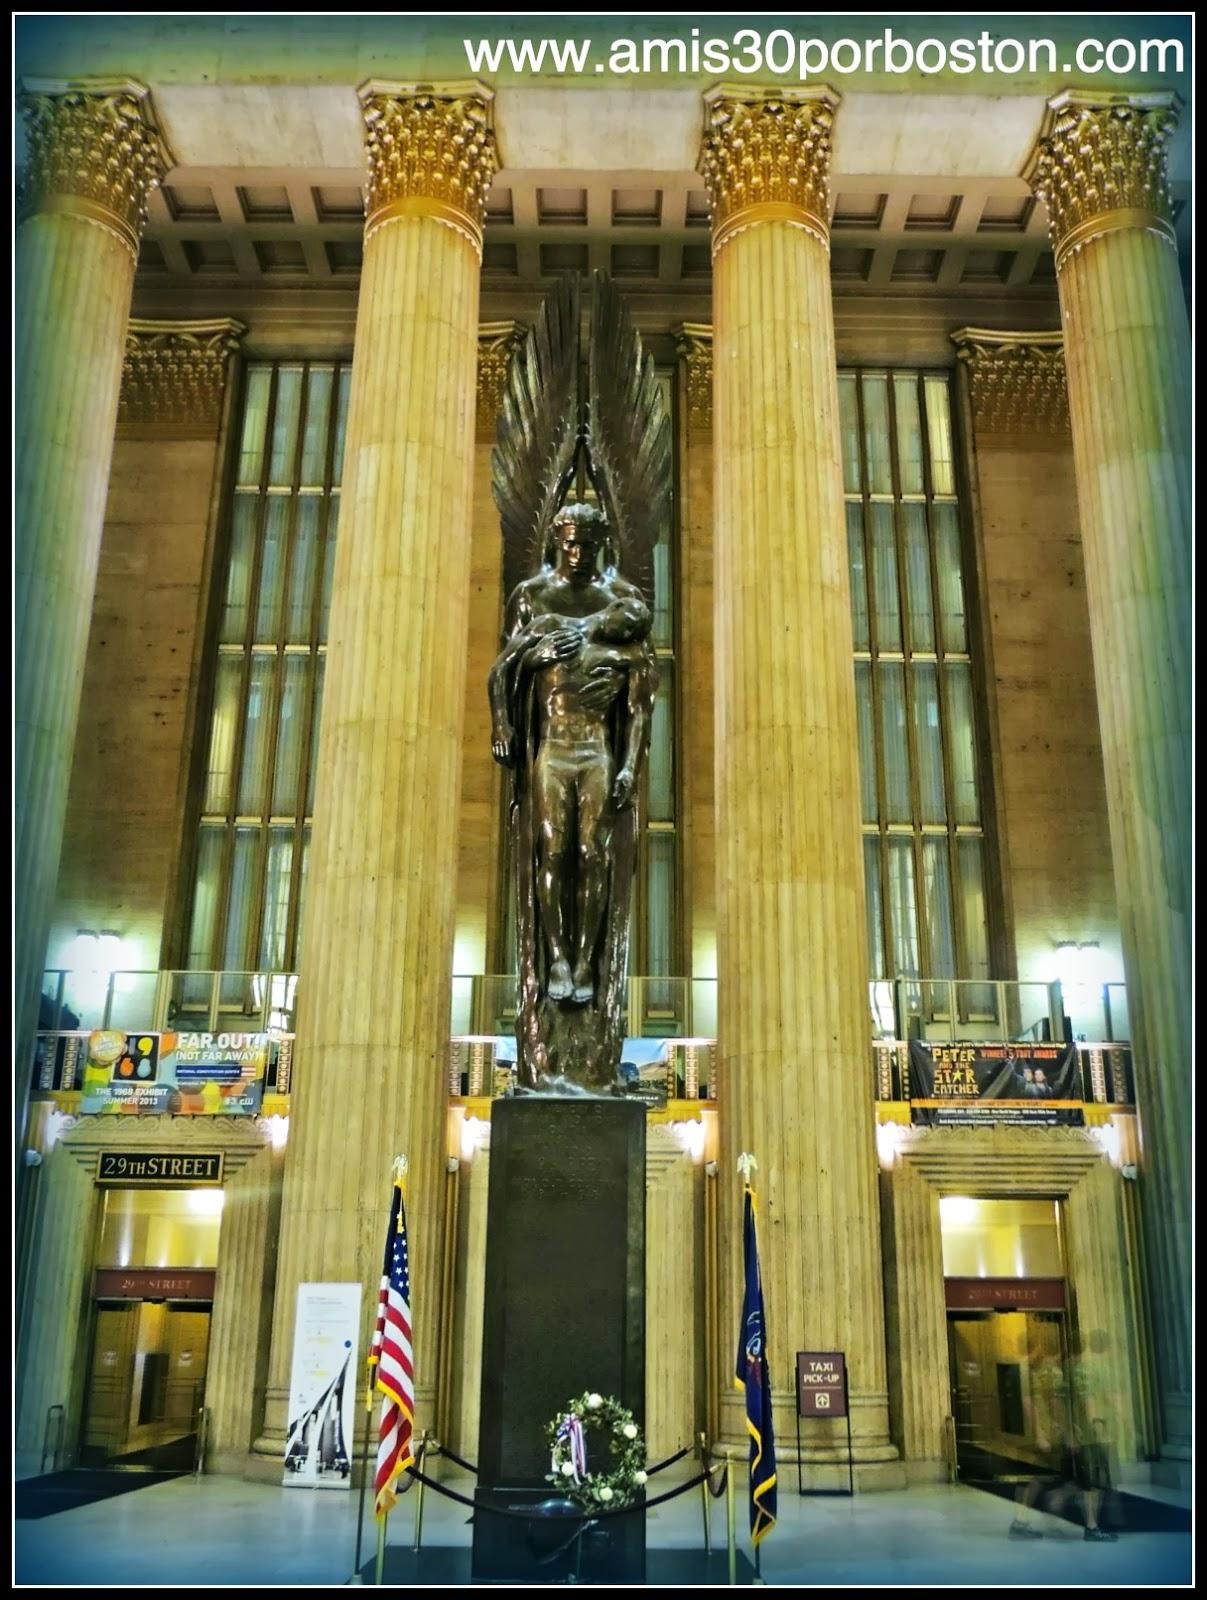 Filadelfia: Philadelphia 30th Street Station